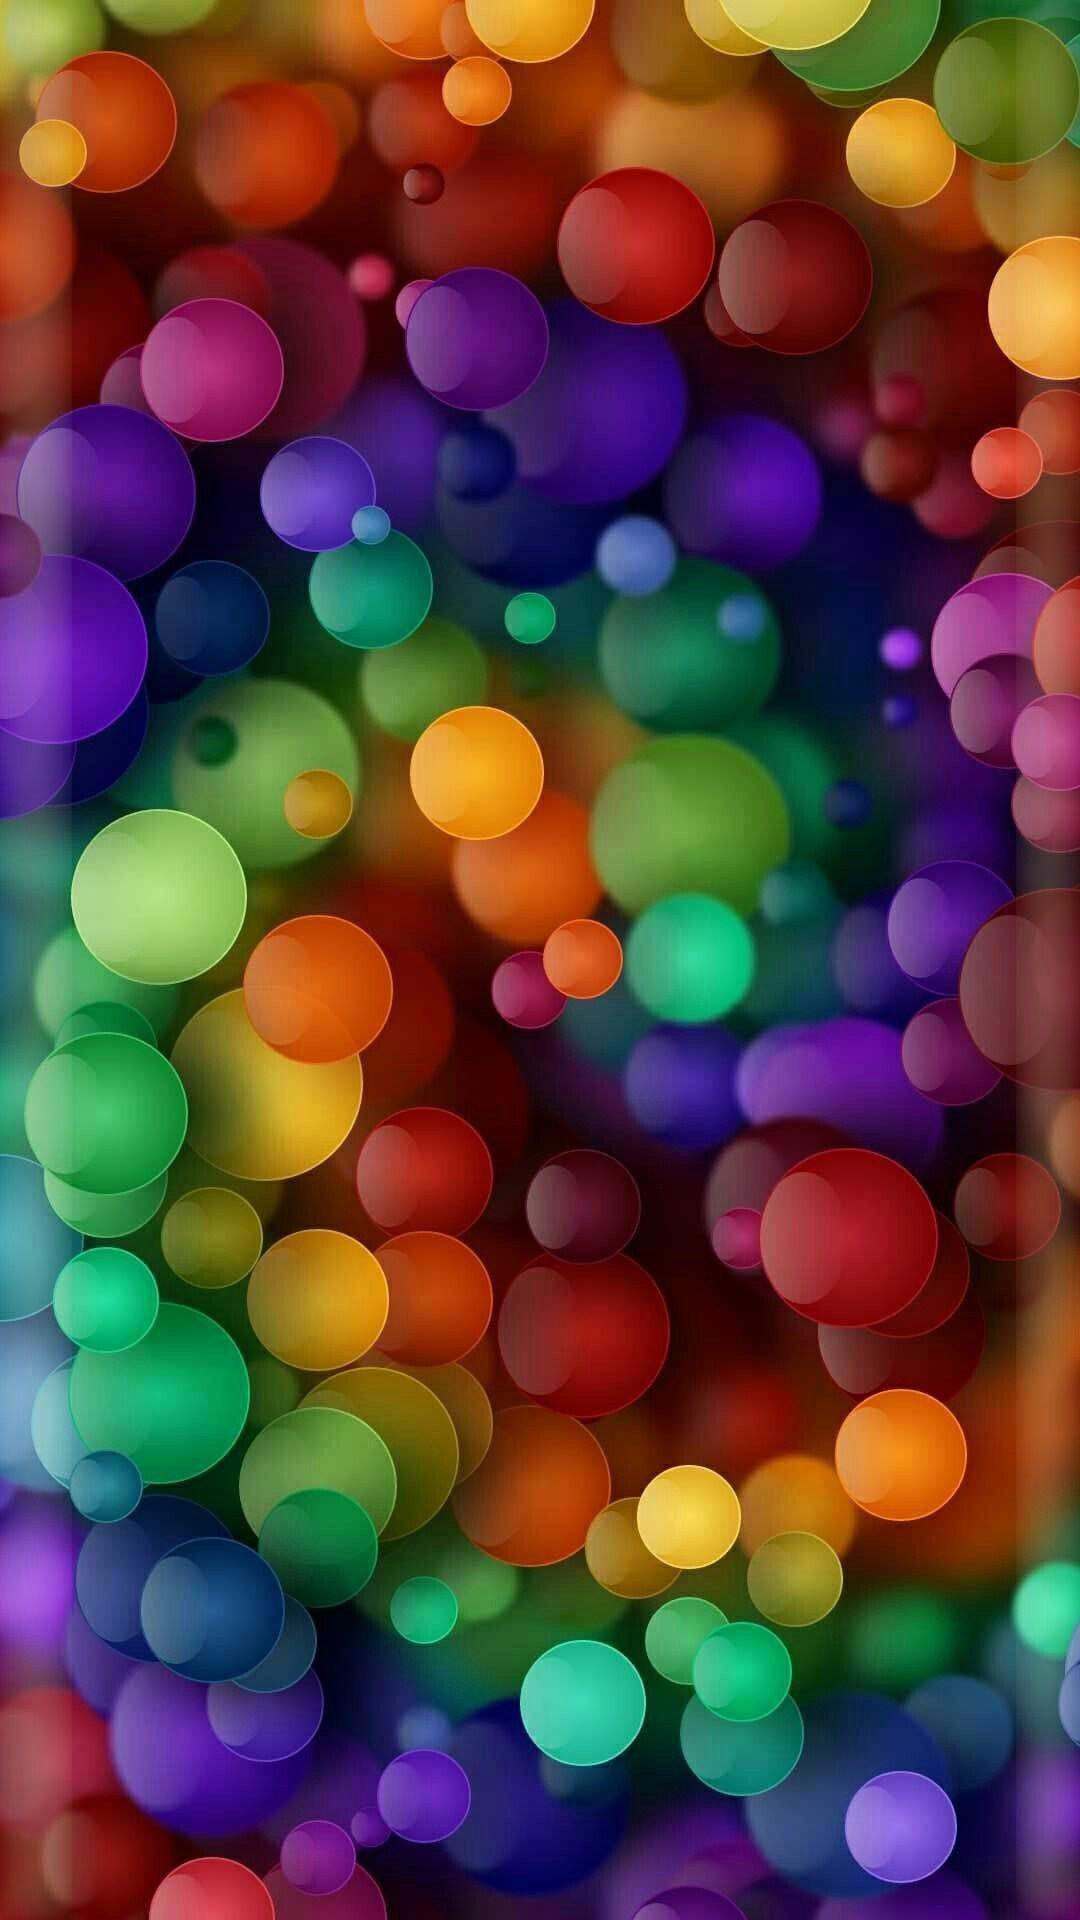 Rainbow Bubbles Background Wallpaper Smartphonewallpaper Bubbles Wallpaper Rainbow Wallpaper Colorful Wallpaper